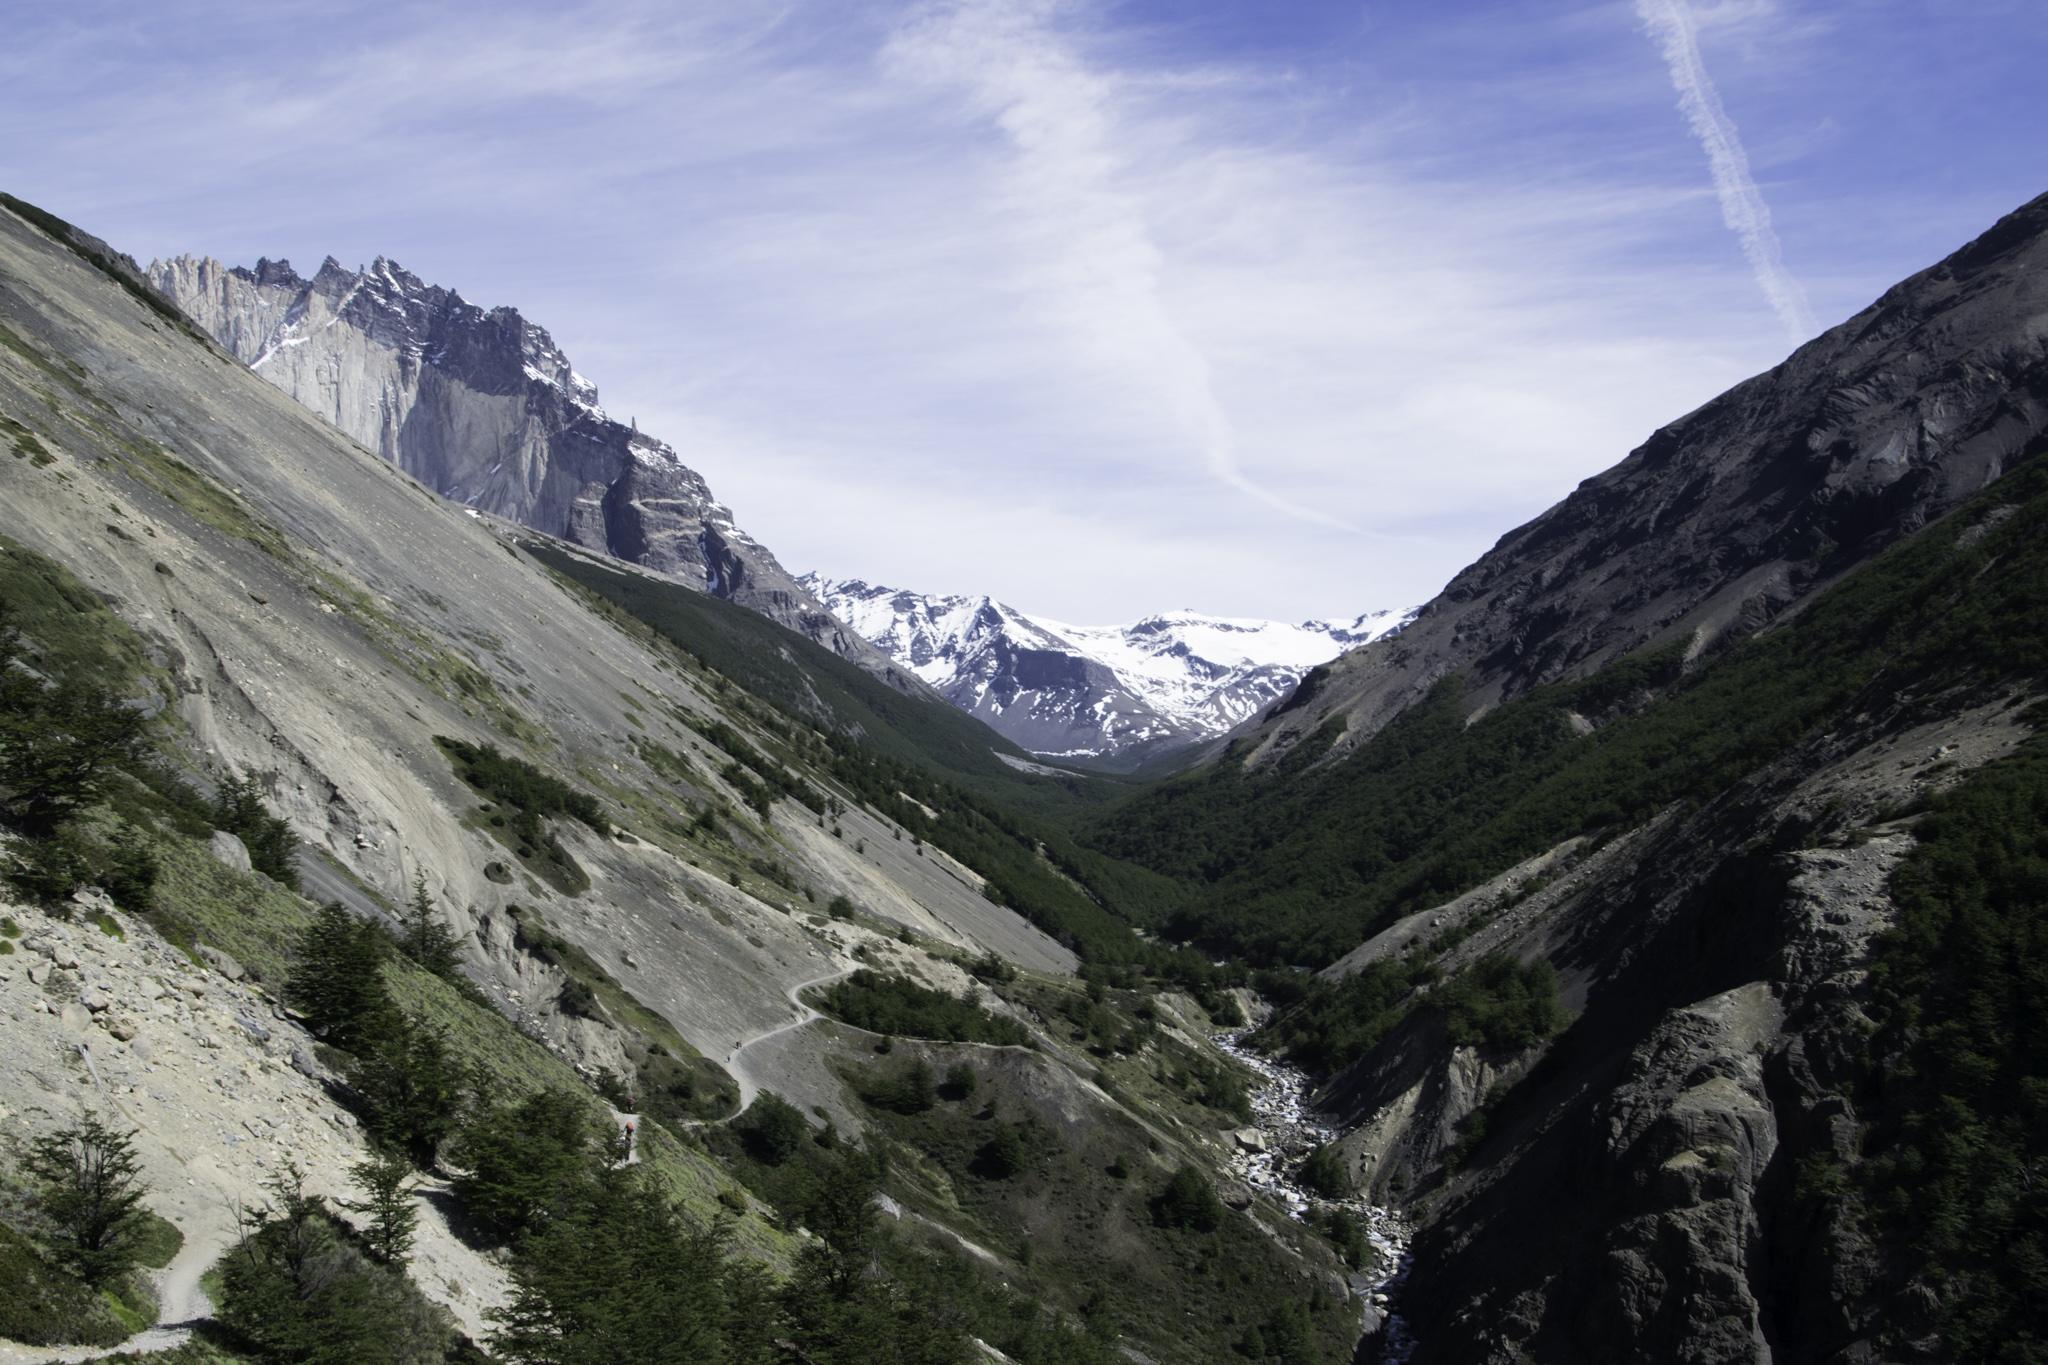 Wanderung zu den Torres (Türmen) del Paine